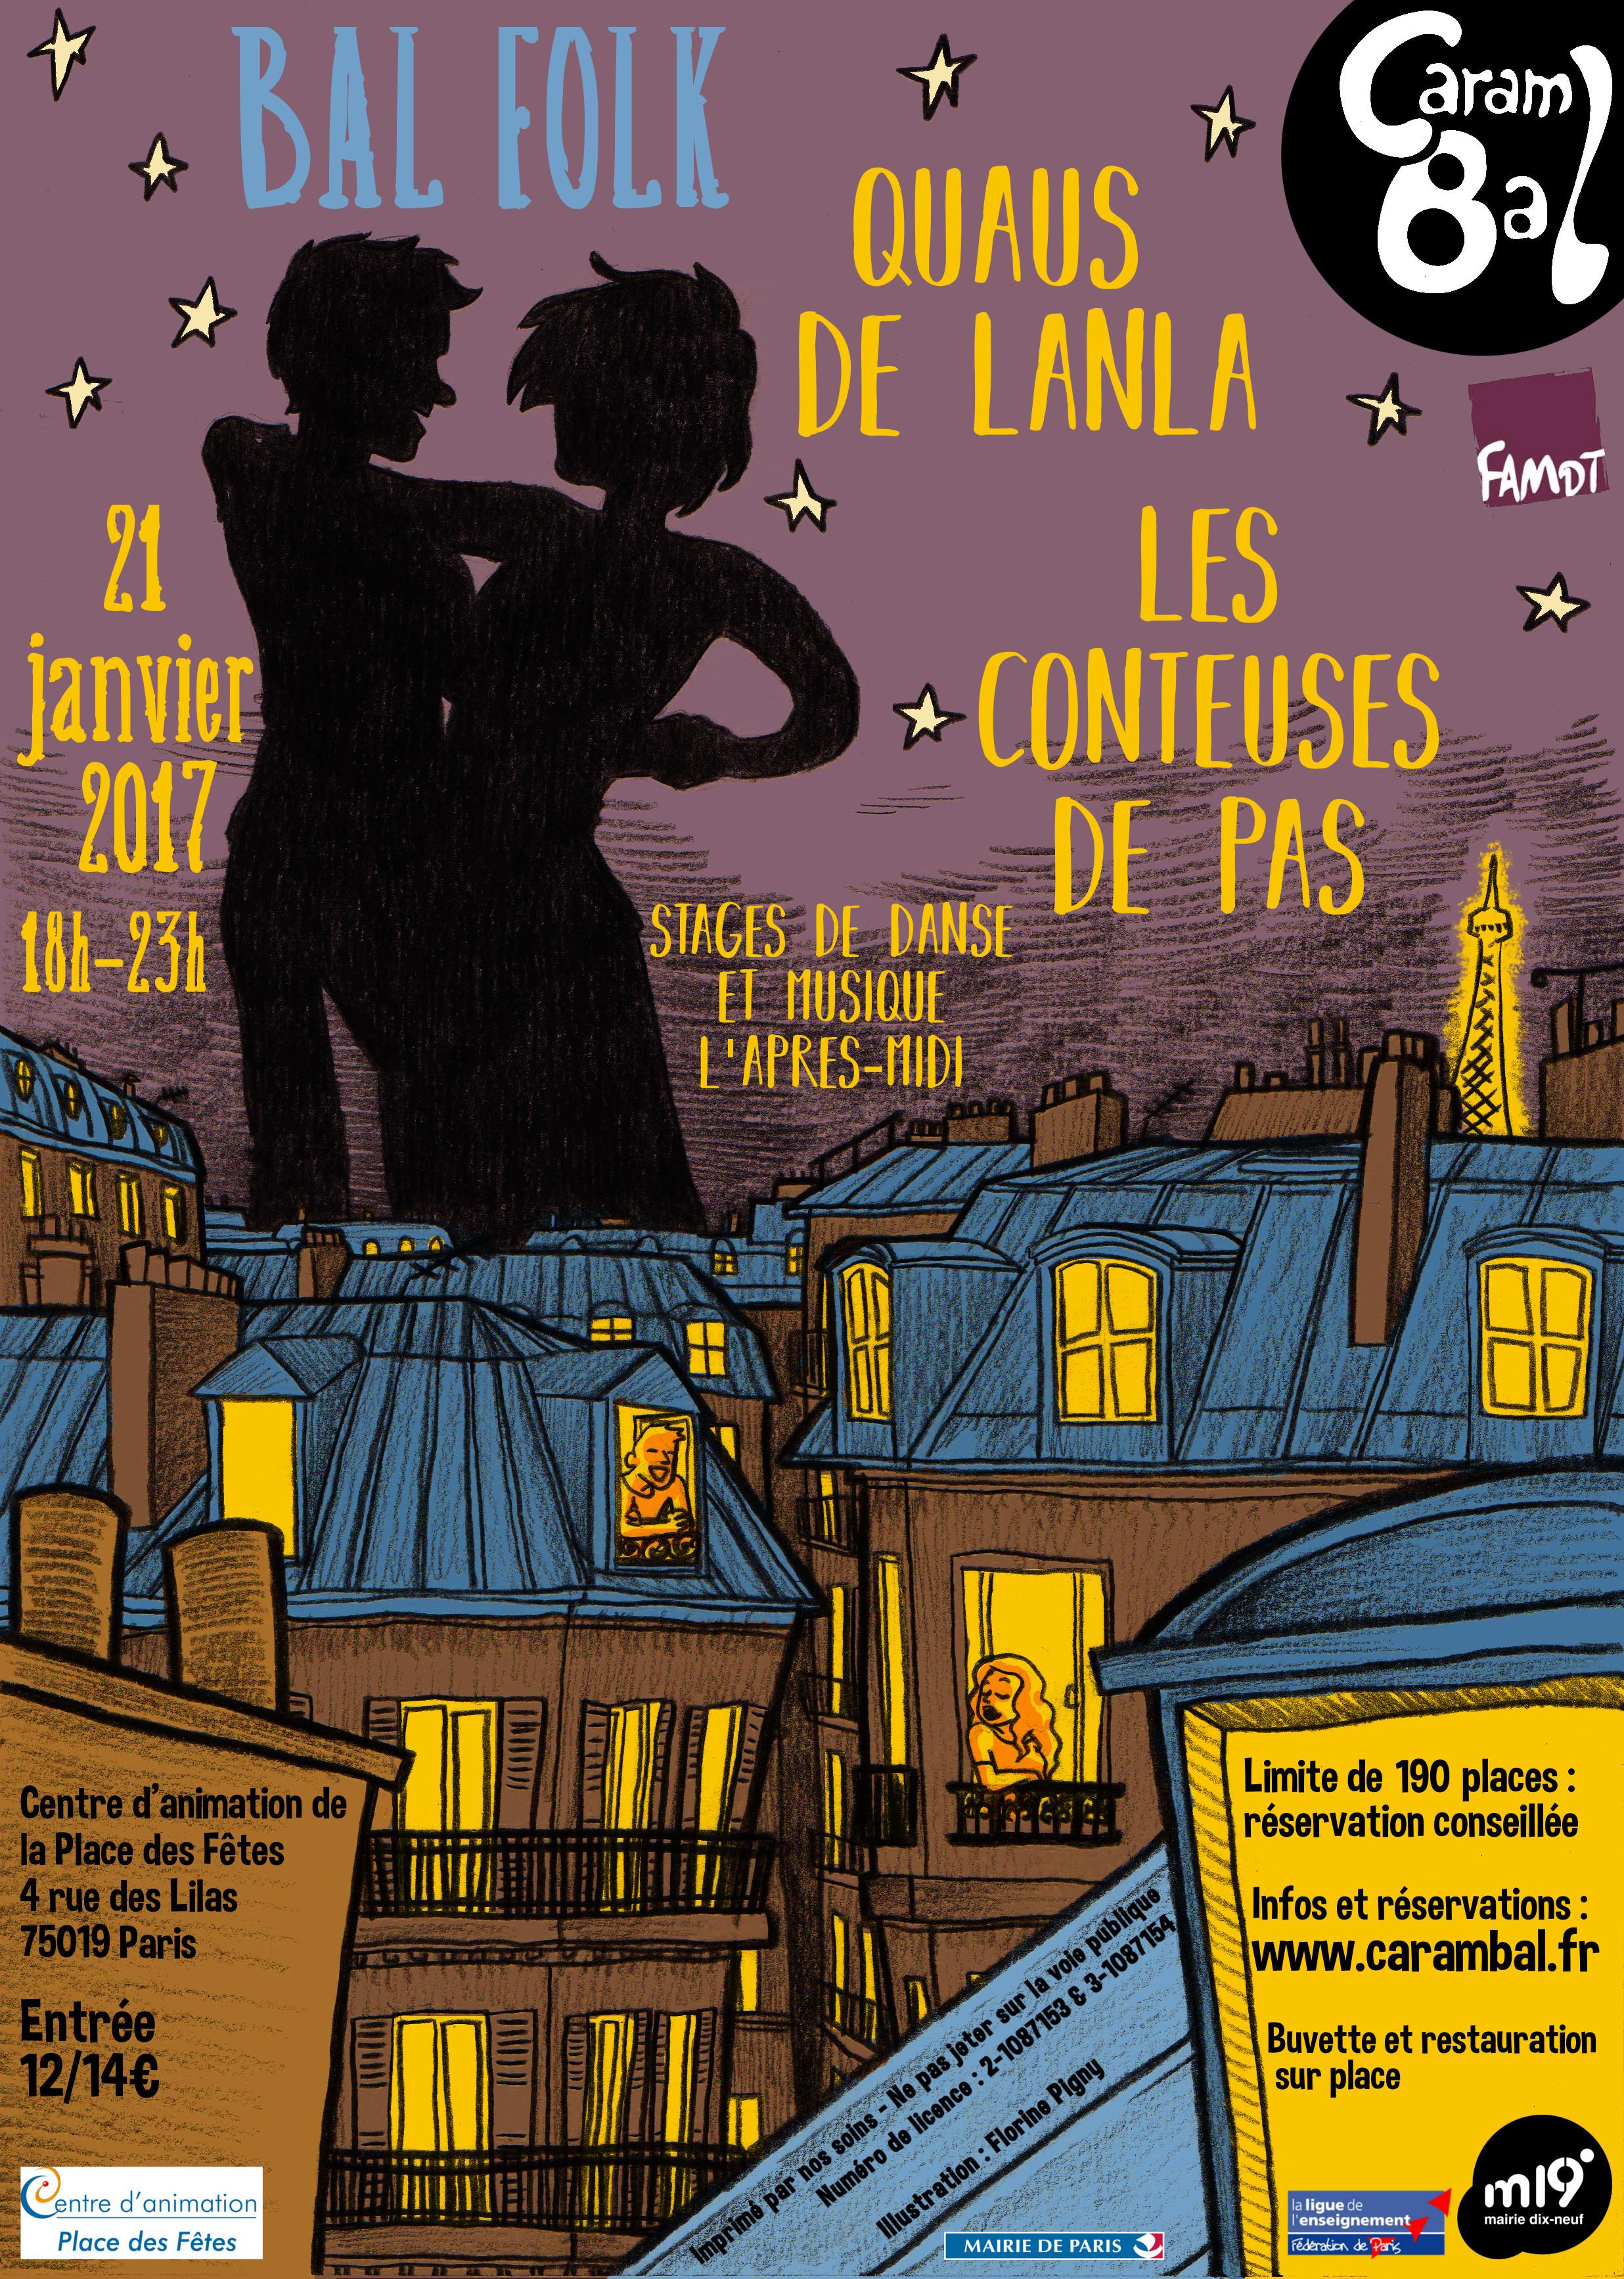 Affiche Bal folk bal folk à la voix à Paris